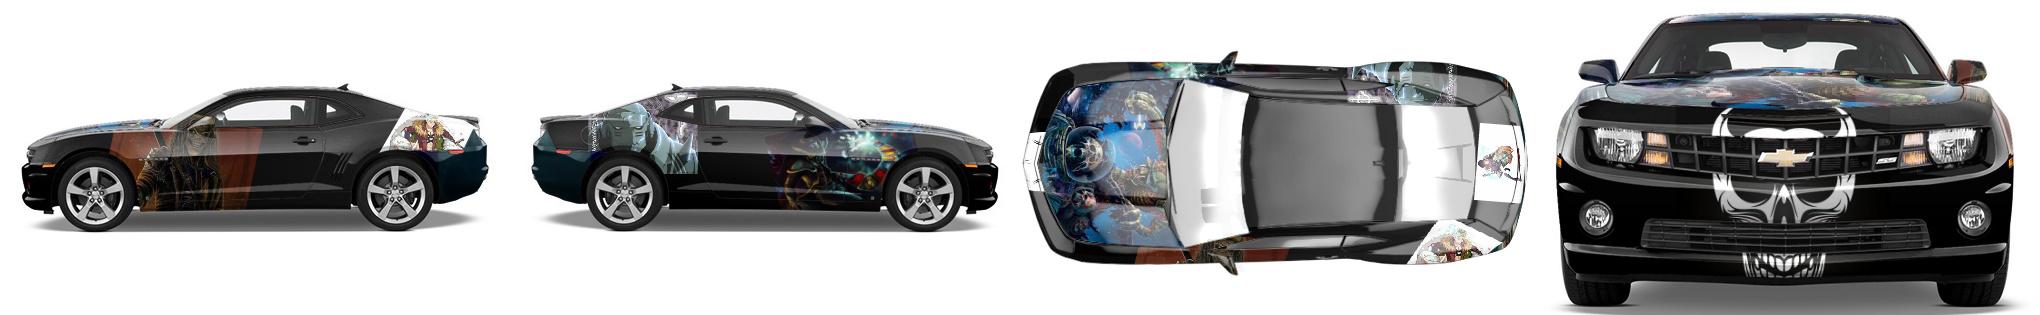 Muscle Car Wrap #50869